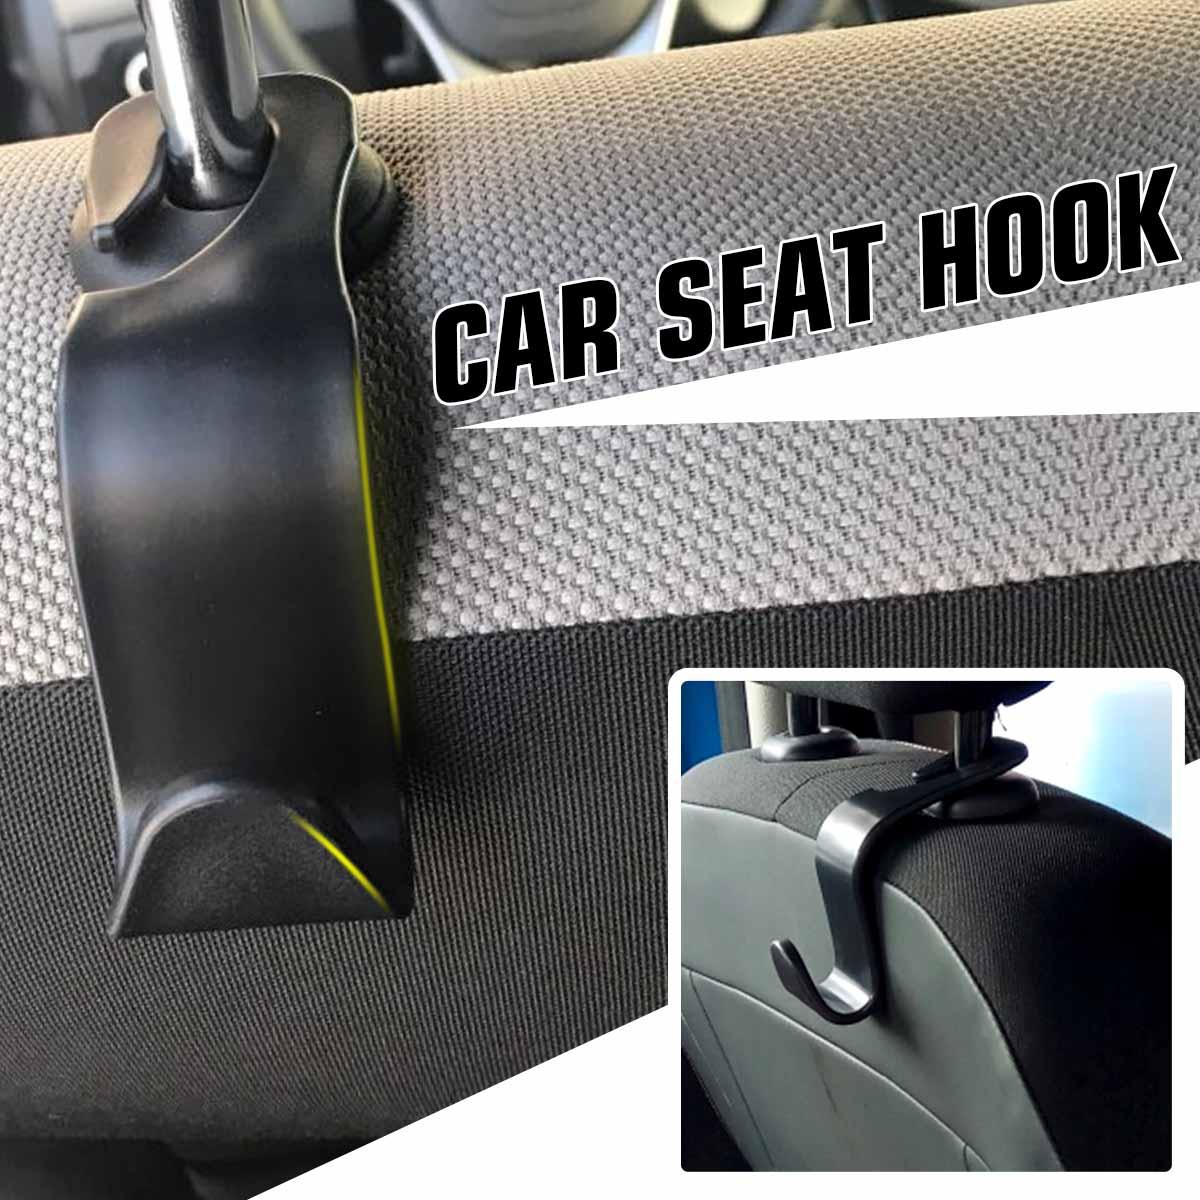 1pcs Ganchos Cabides Organizador Do Carro Auto Universal para Bmw Audi E46 E39 A3 A6 C5 A4 B6 Mercedes W203 w211 Mini Cooper